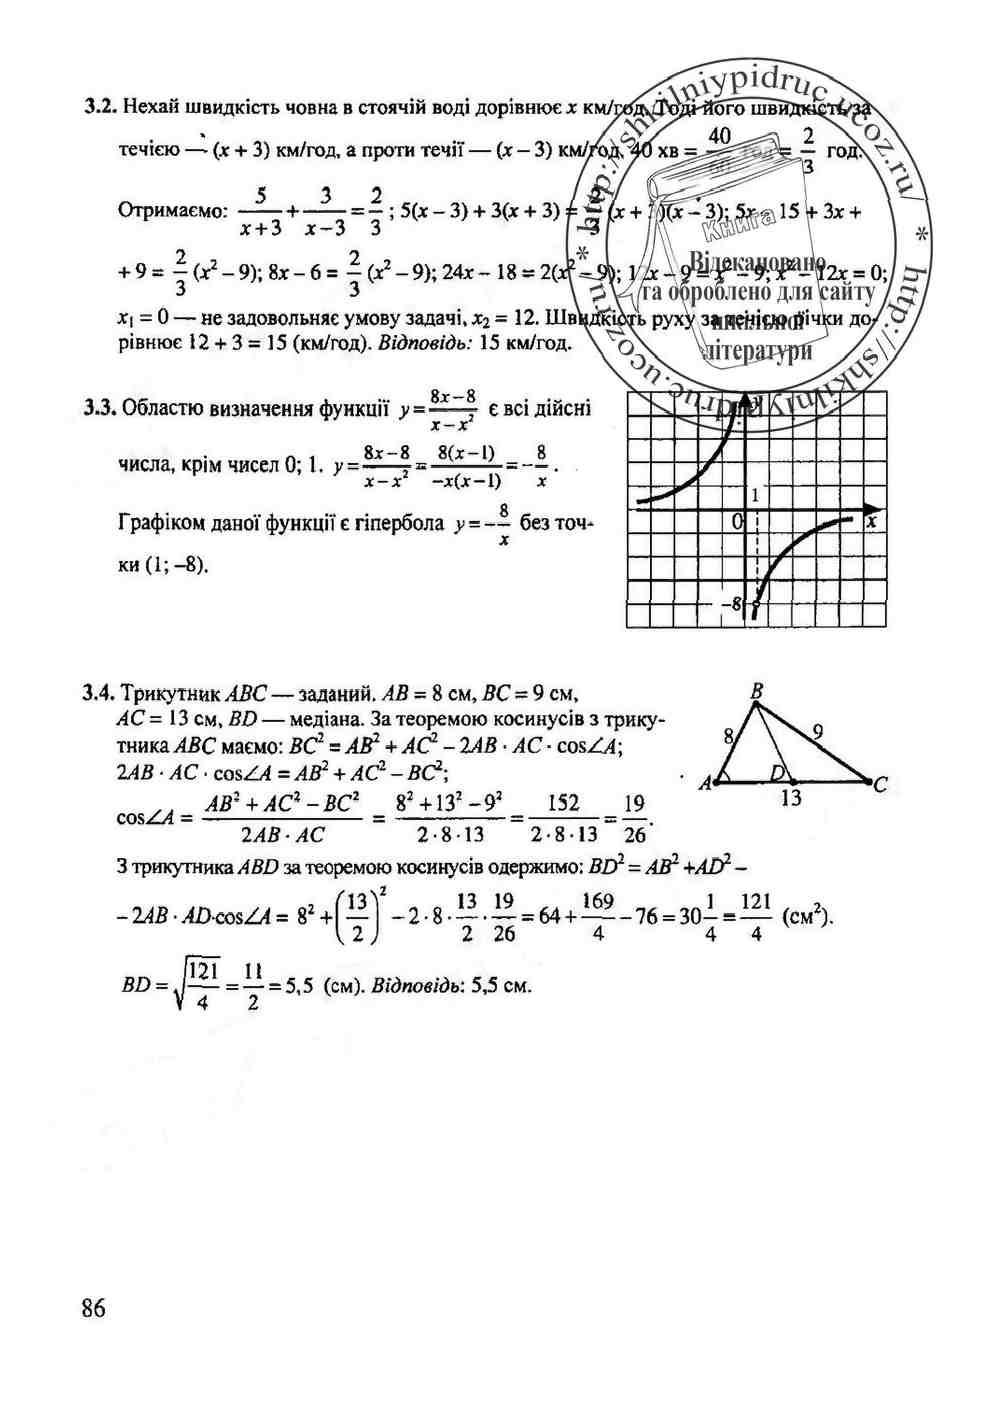 математике класс решебник дпа 2018 для год 9 по